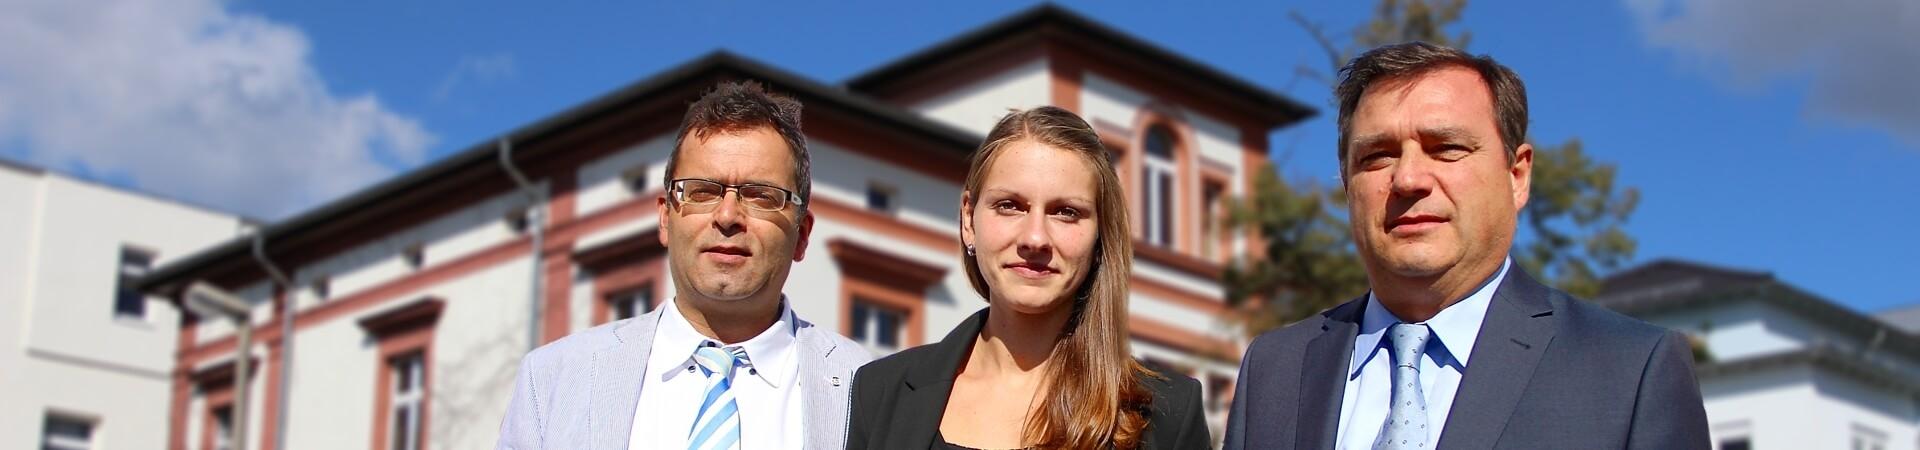 Anwaltskanzlei Kindermann & Bölle